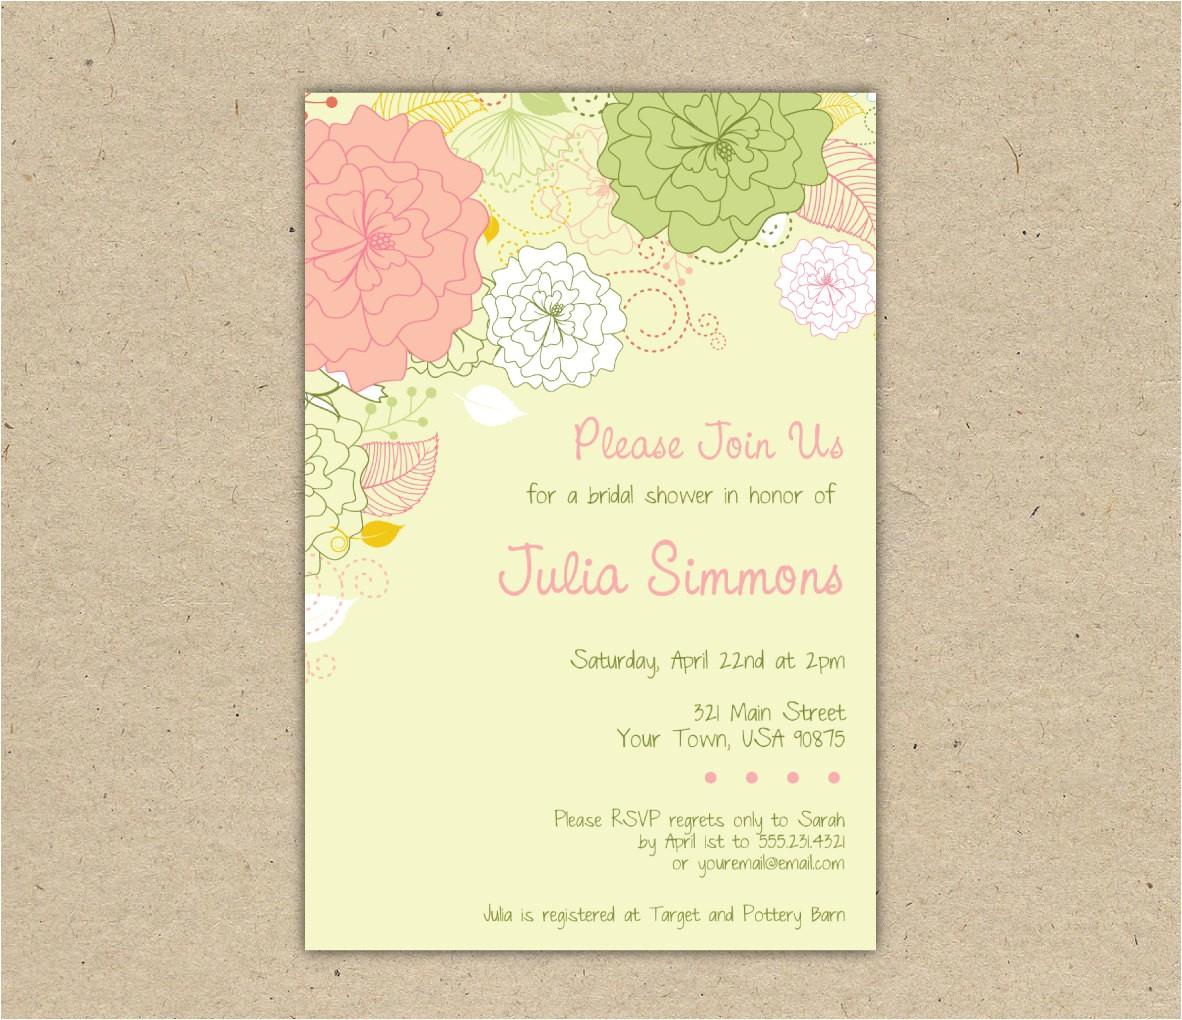 free wedding shower invitation templates